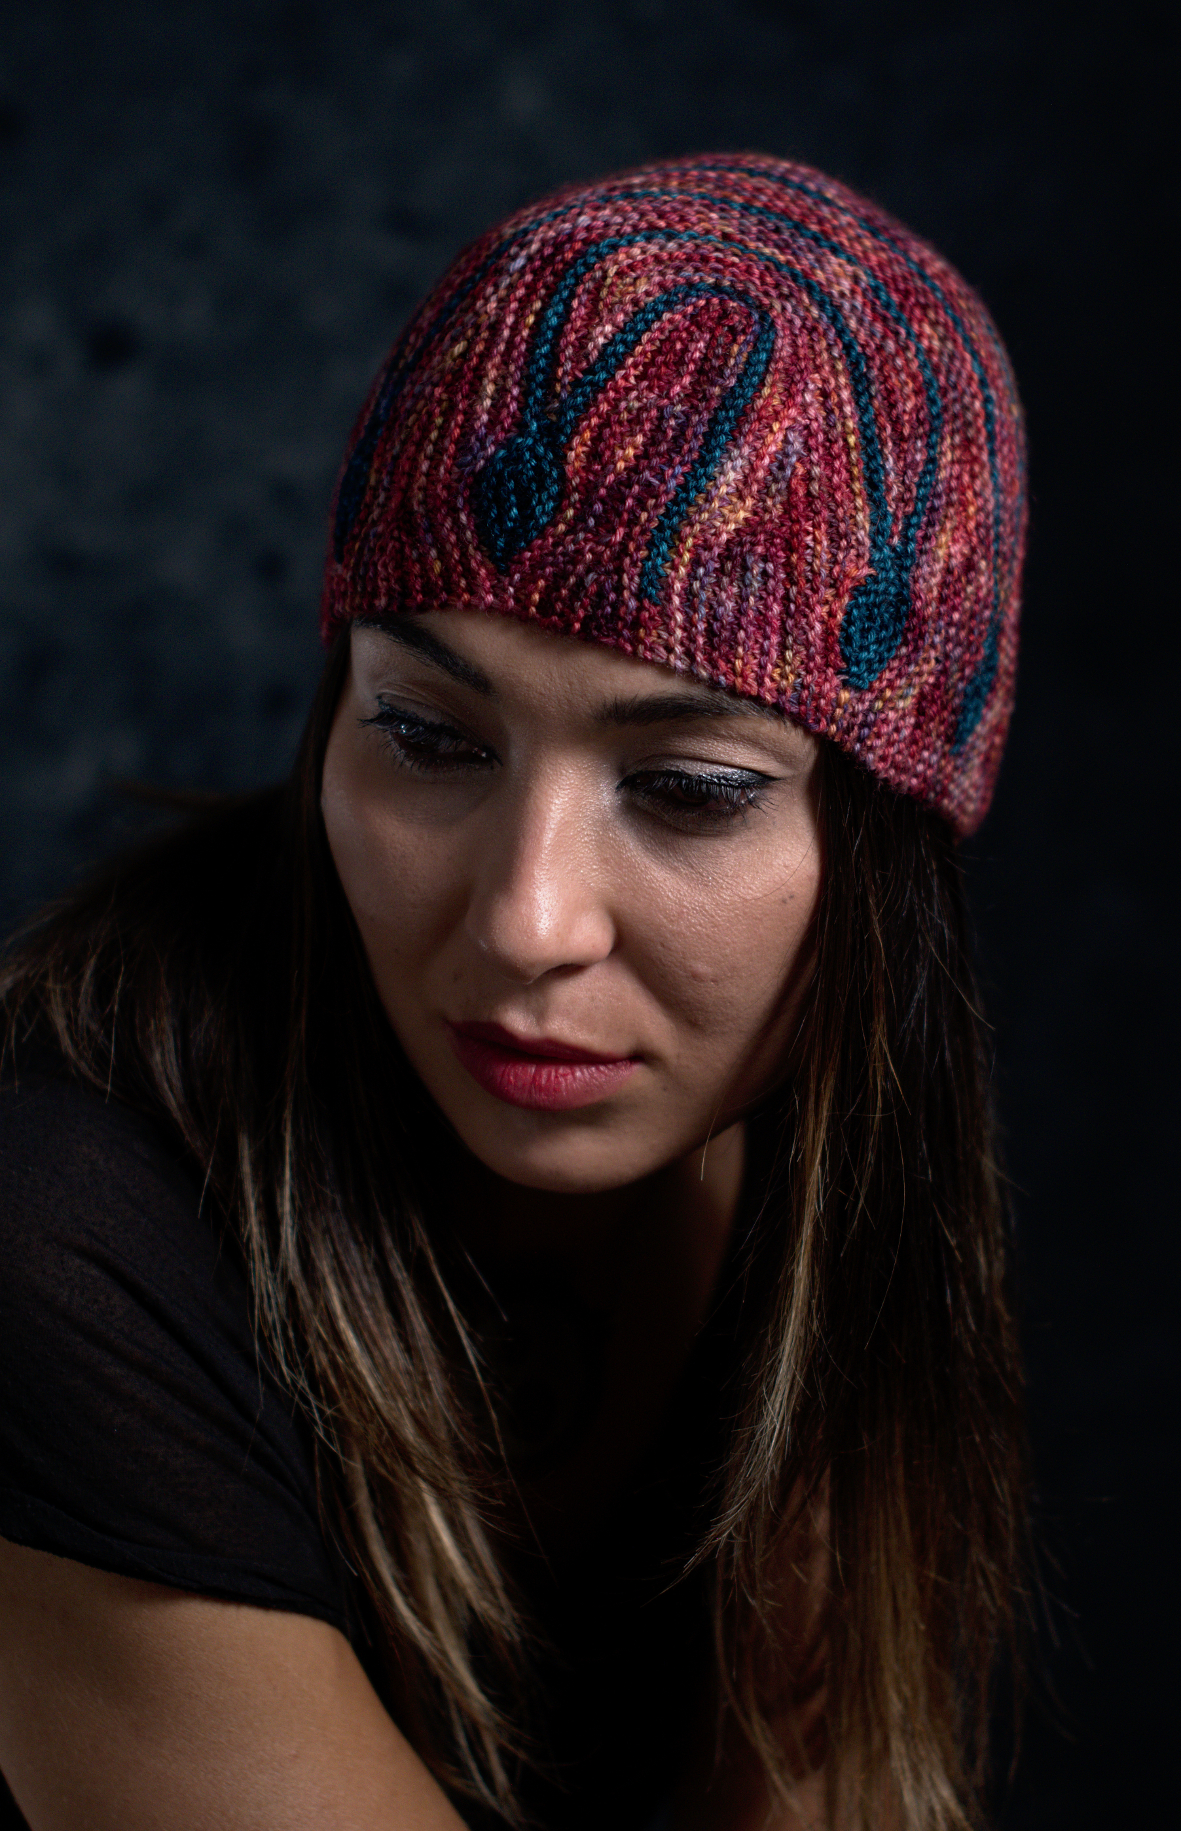 Oscillare sideways knit short row colourwork hat hand knitting pattern